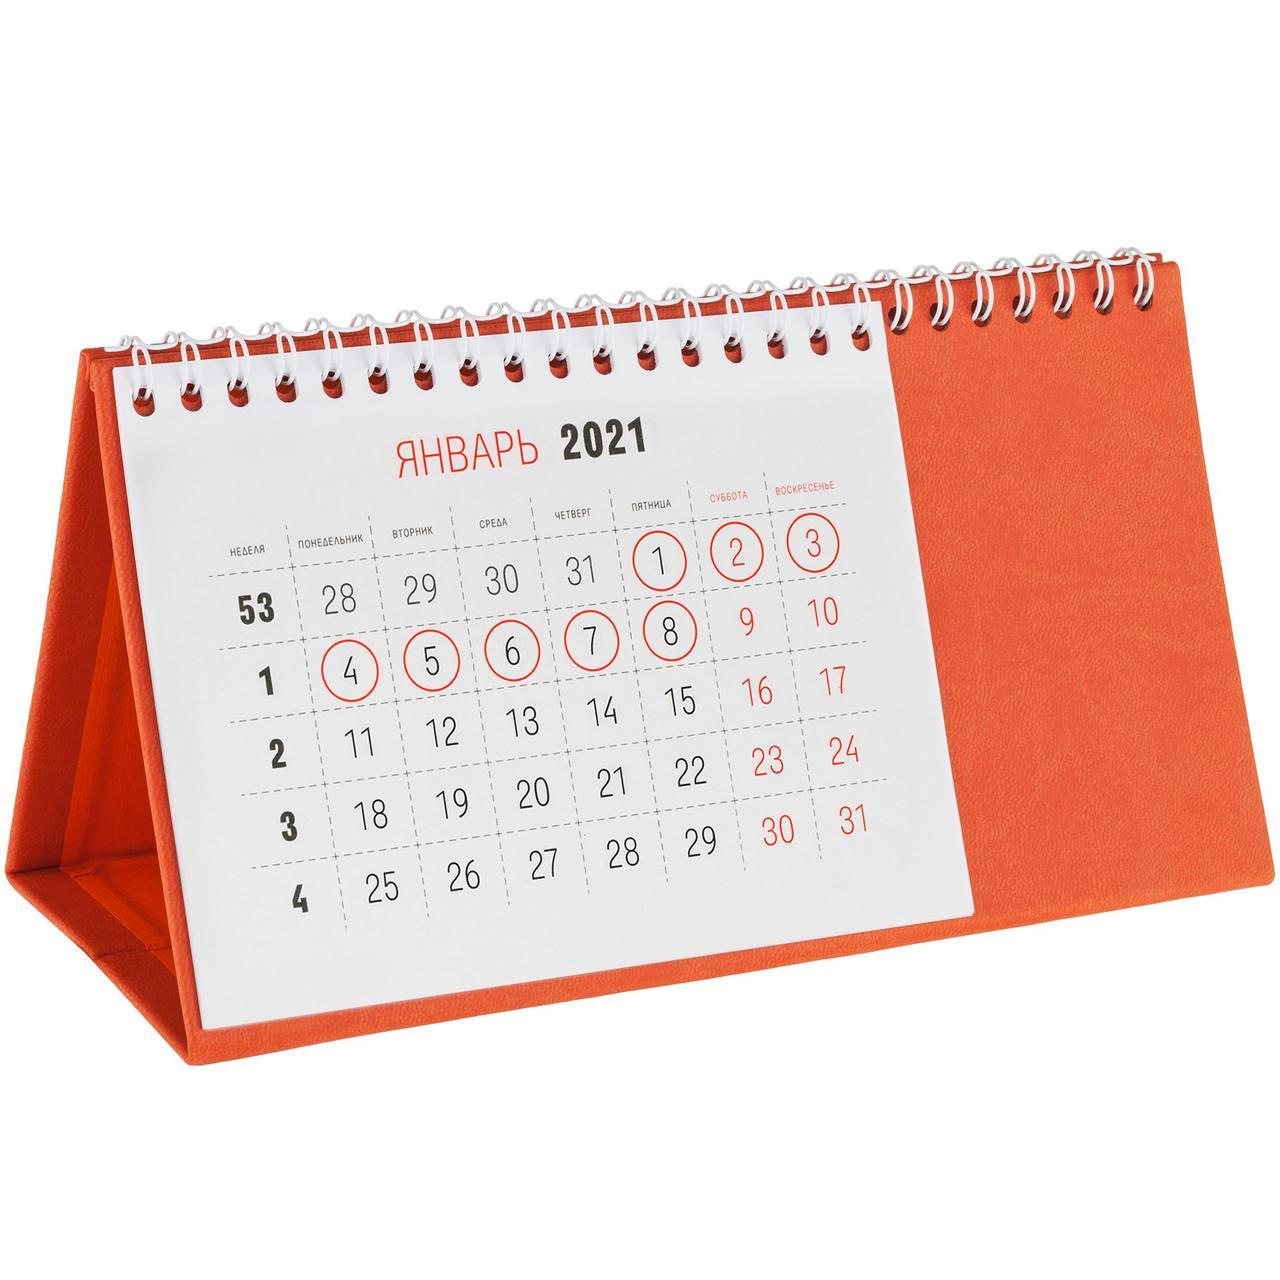 Календарь настольный Brand, оранжевый (артикул 2808.20)